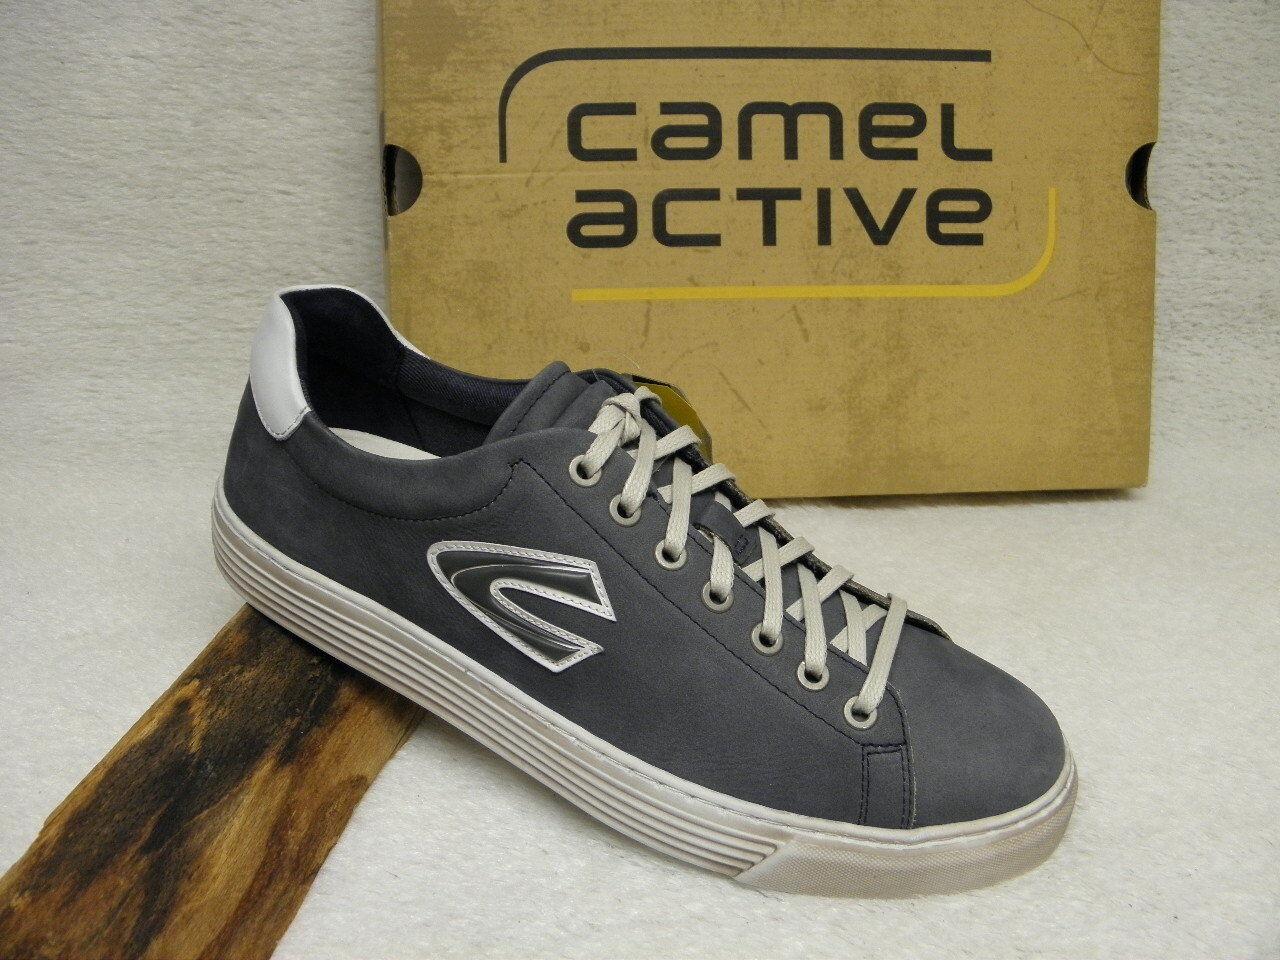 camel camel camel active ® SALE, reduziert,